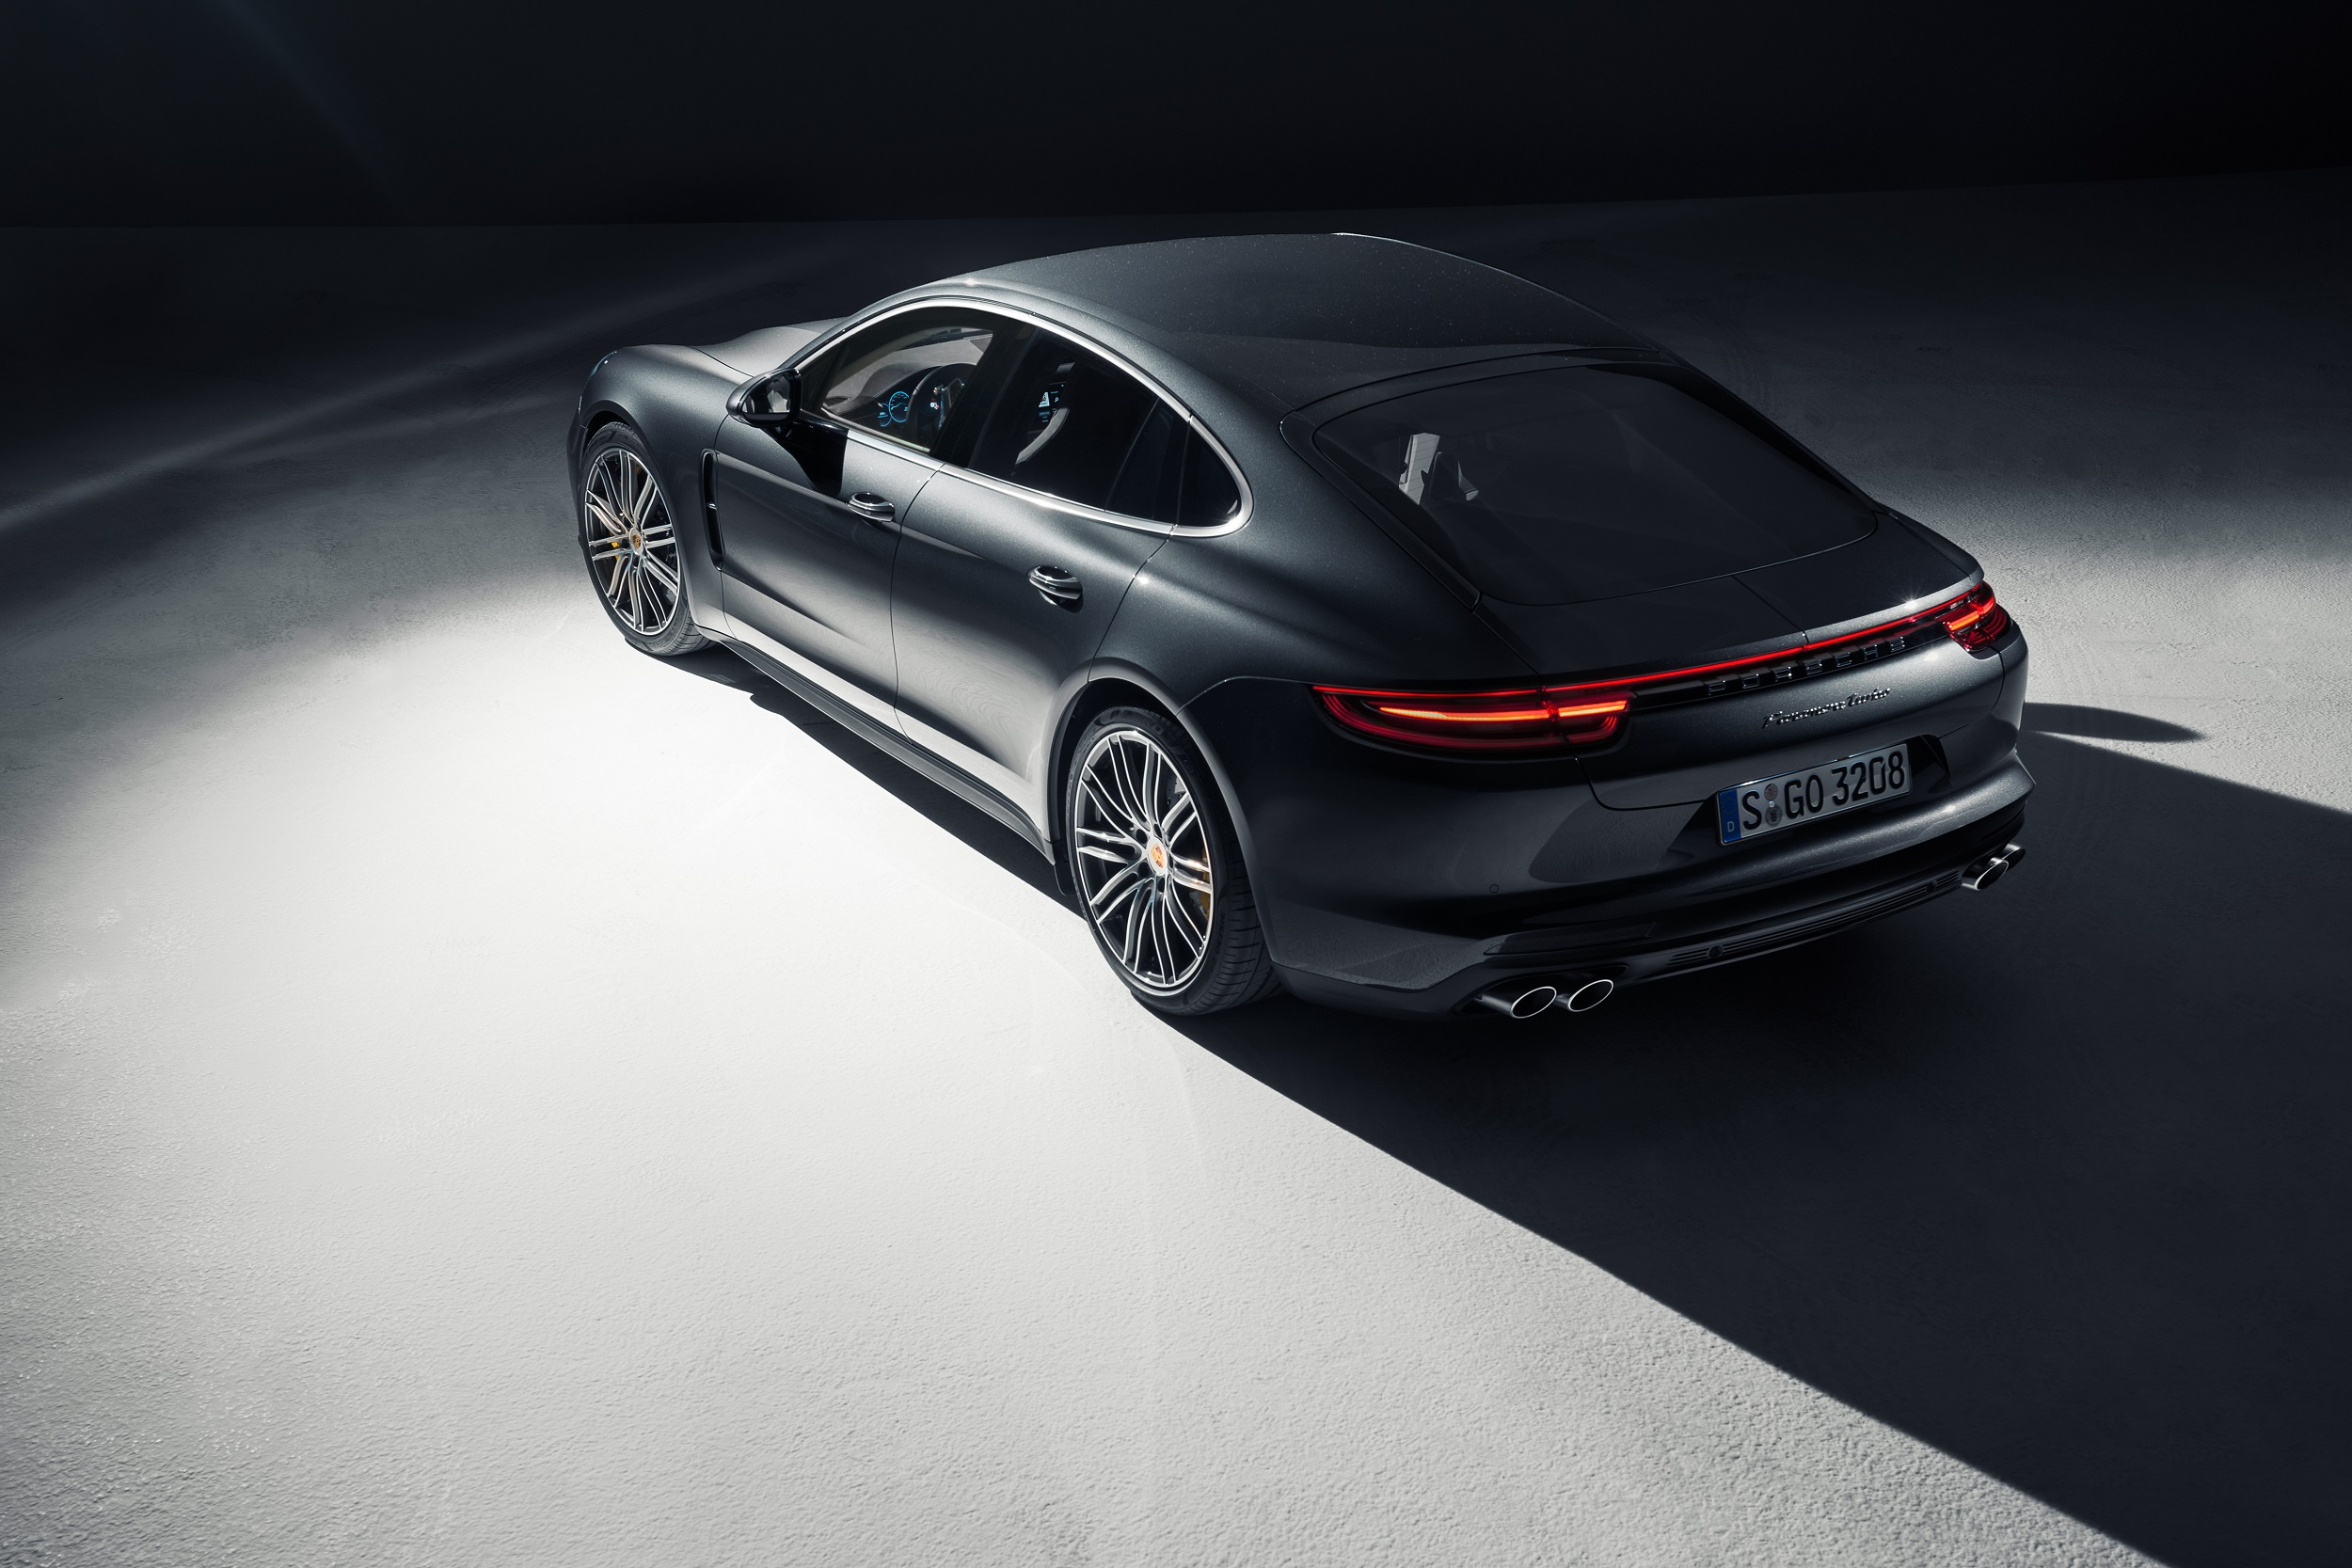 Porsche Panamera side and rear